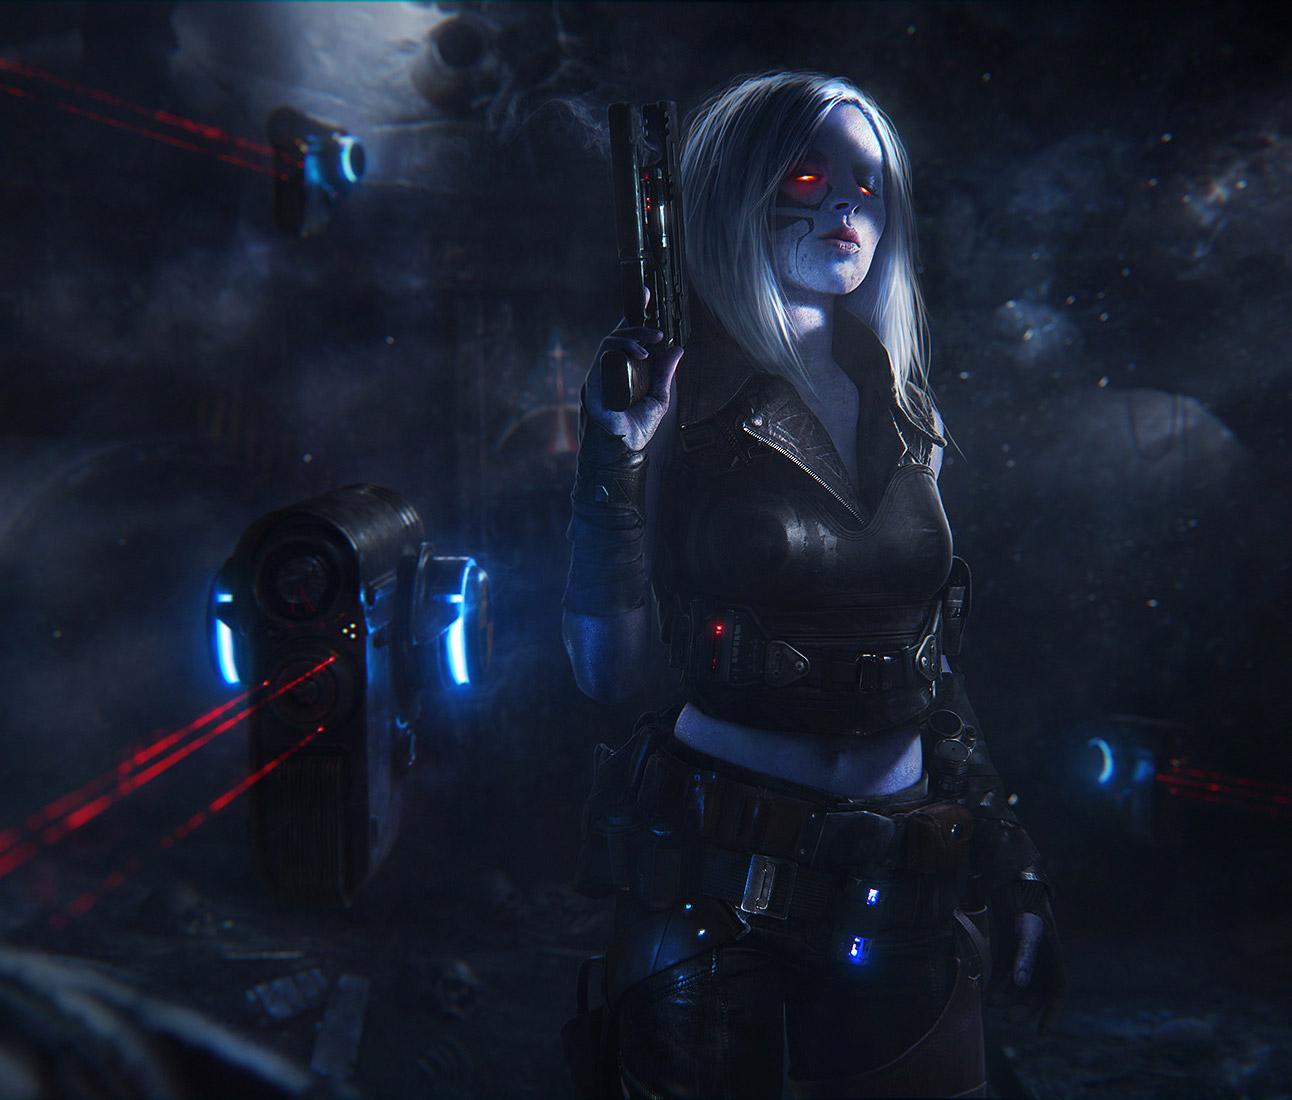 Sci Fi Cyberpunk Character Art